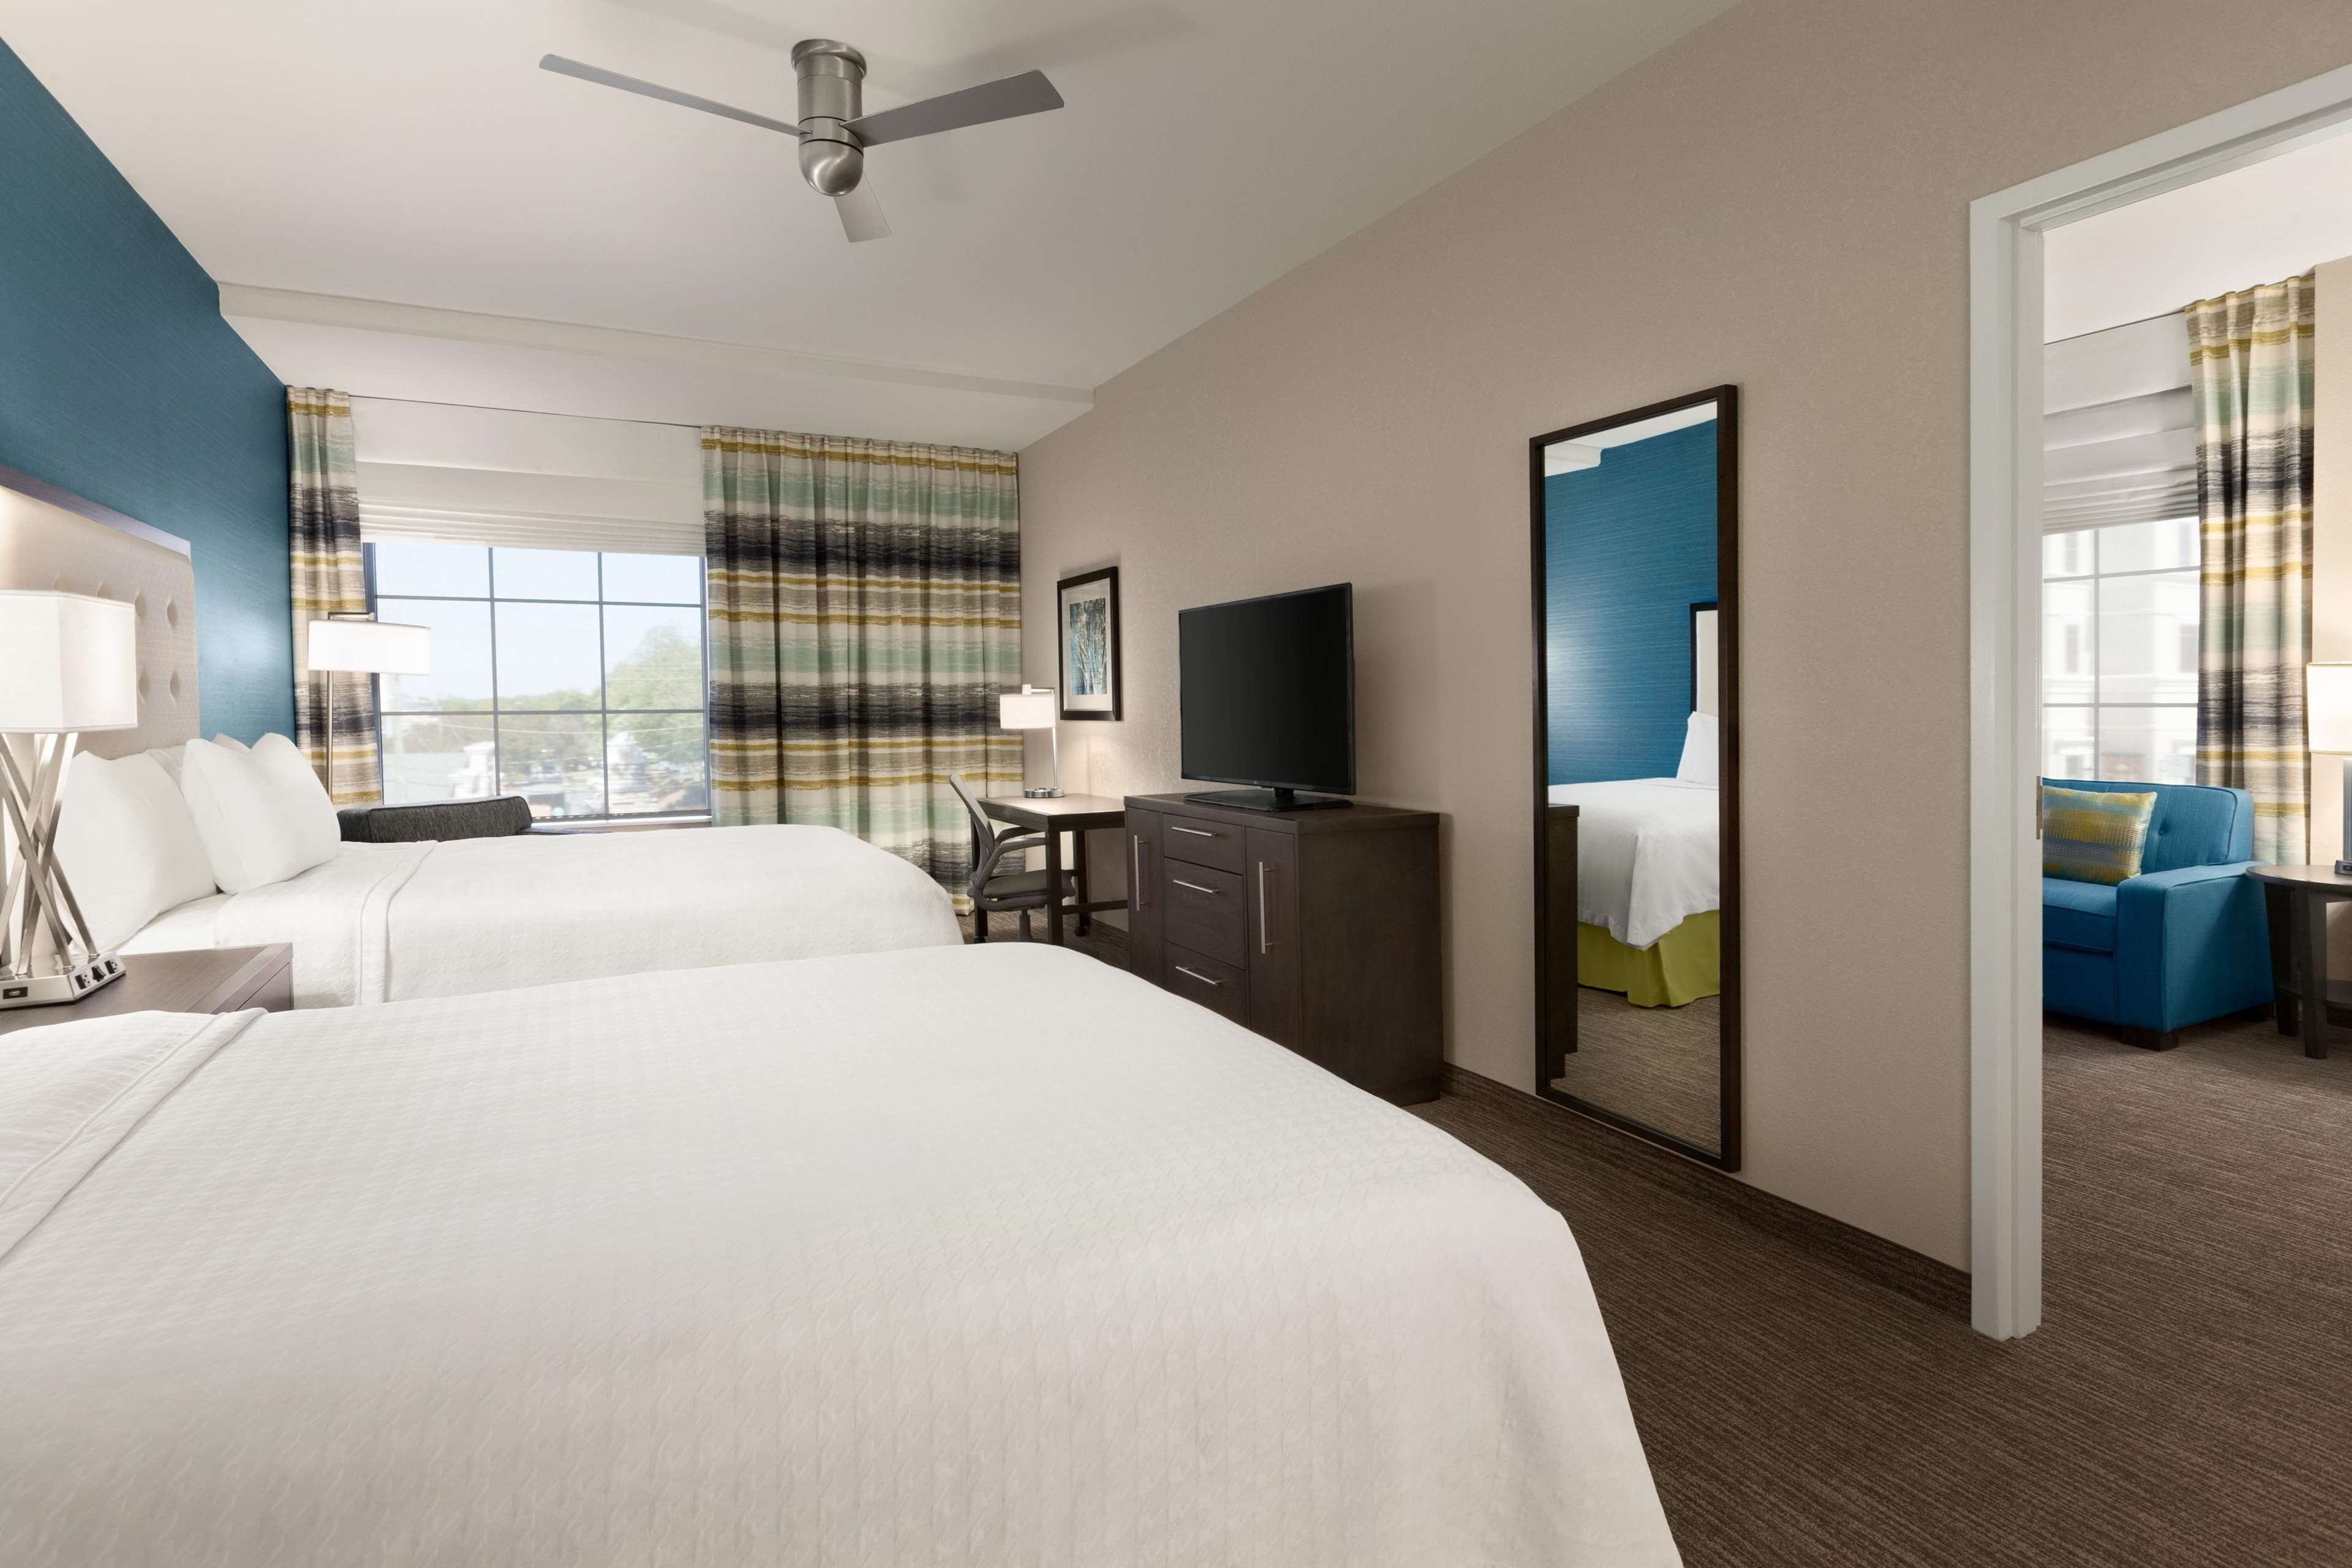 Homewood Suites by Hilton Charlotte/SouthPark image 5